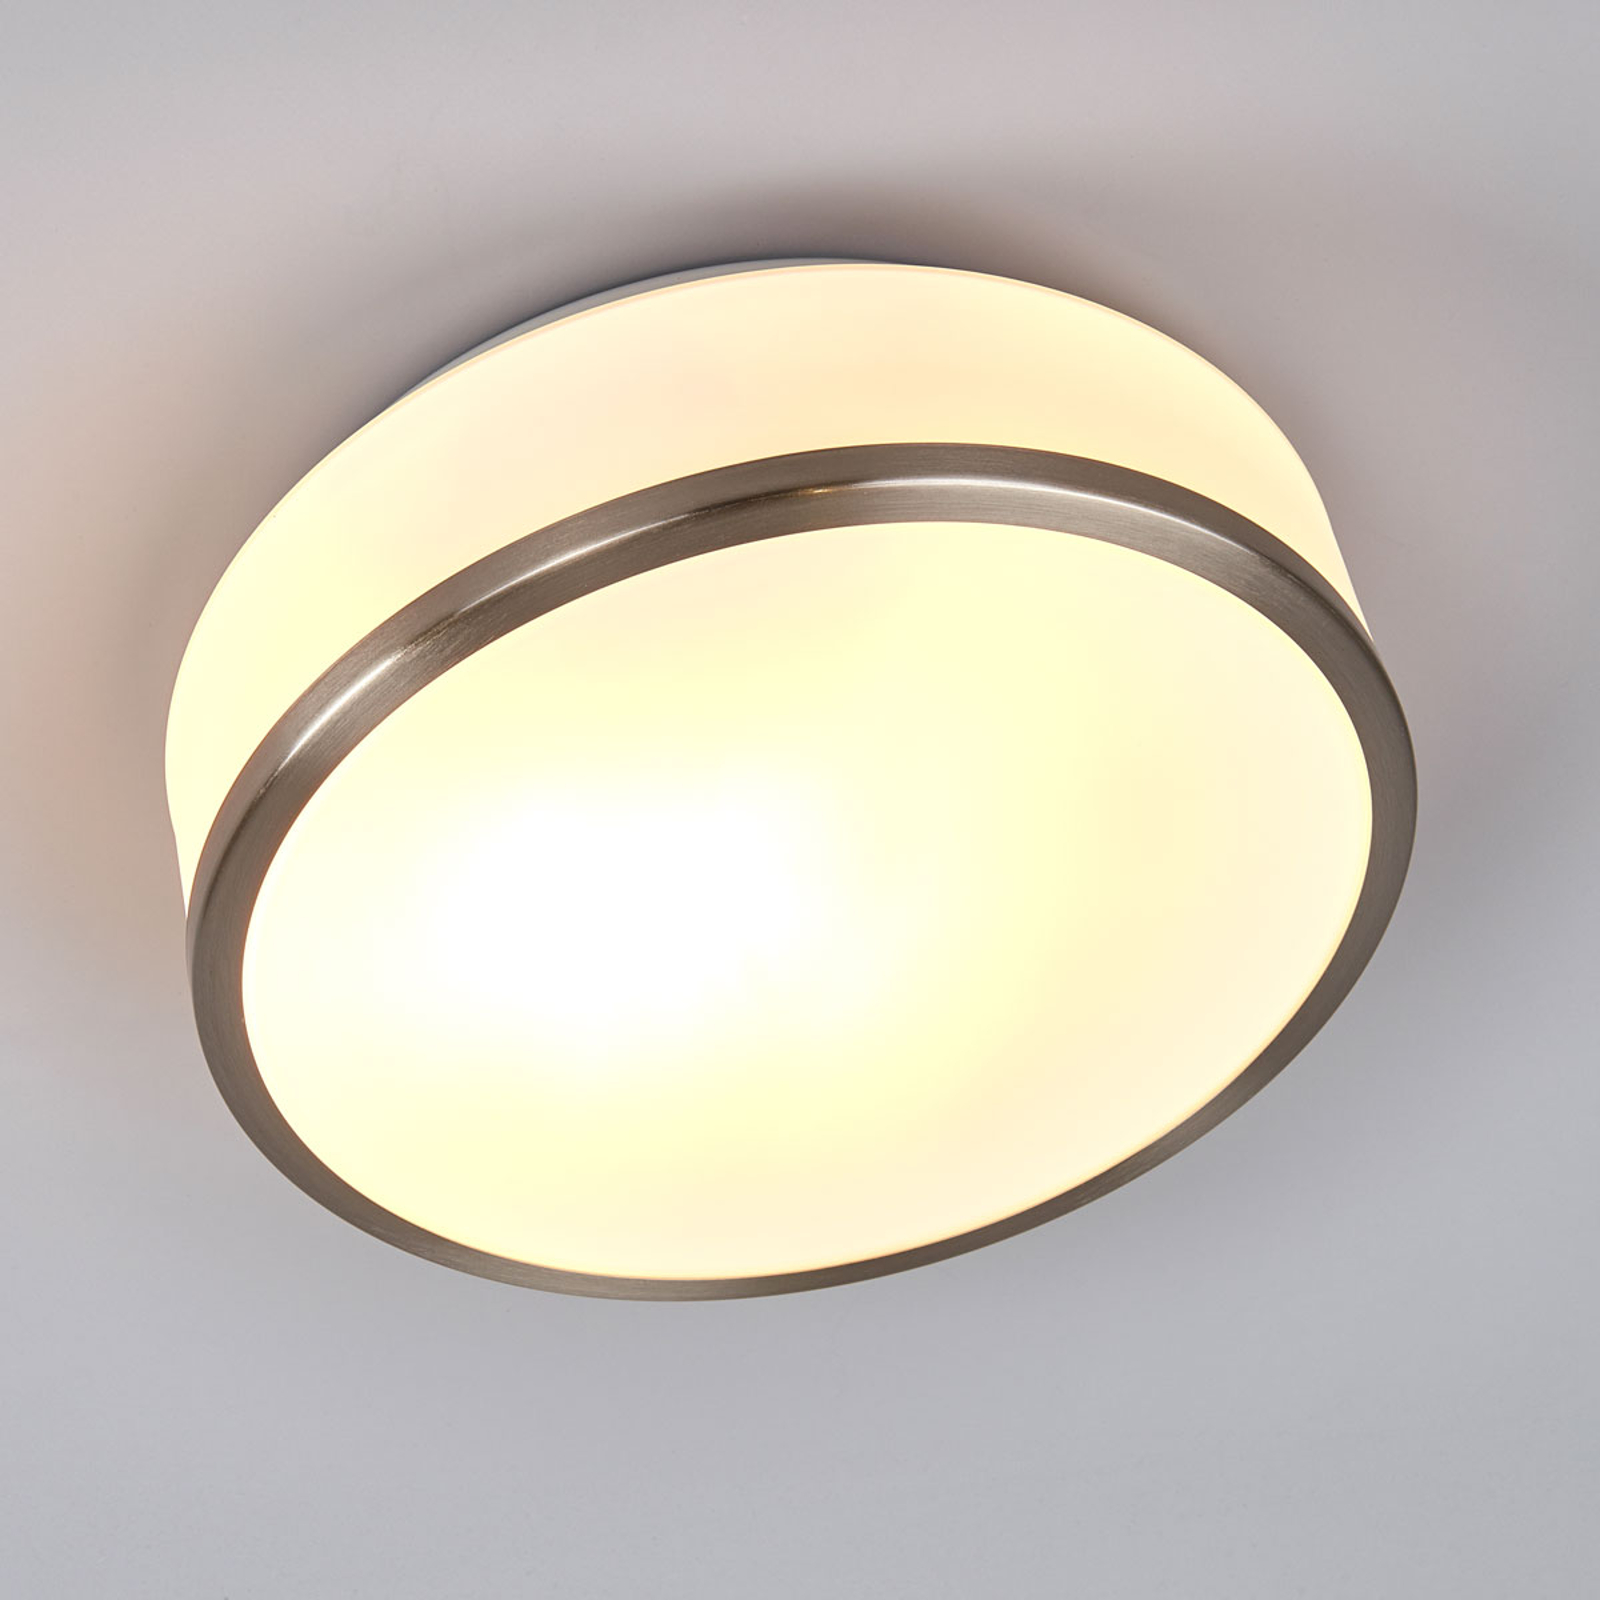 Flush-kattovalo, IP44, Ø 28 cm, satinoitu hopea